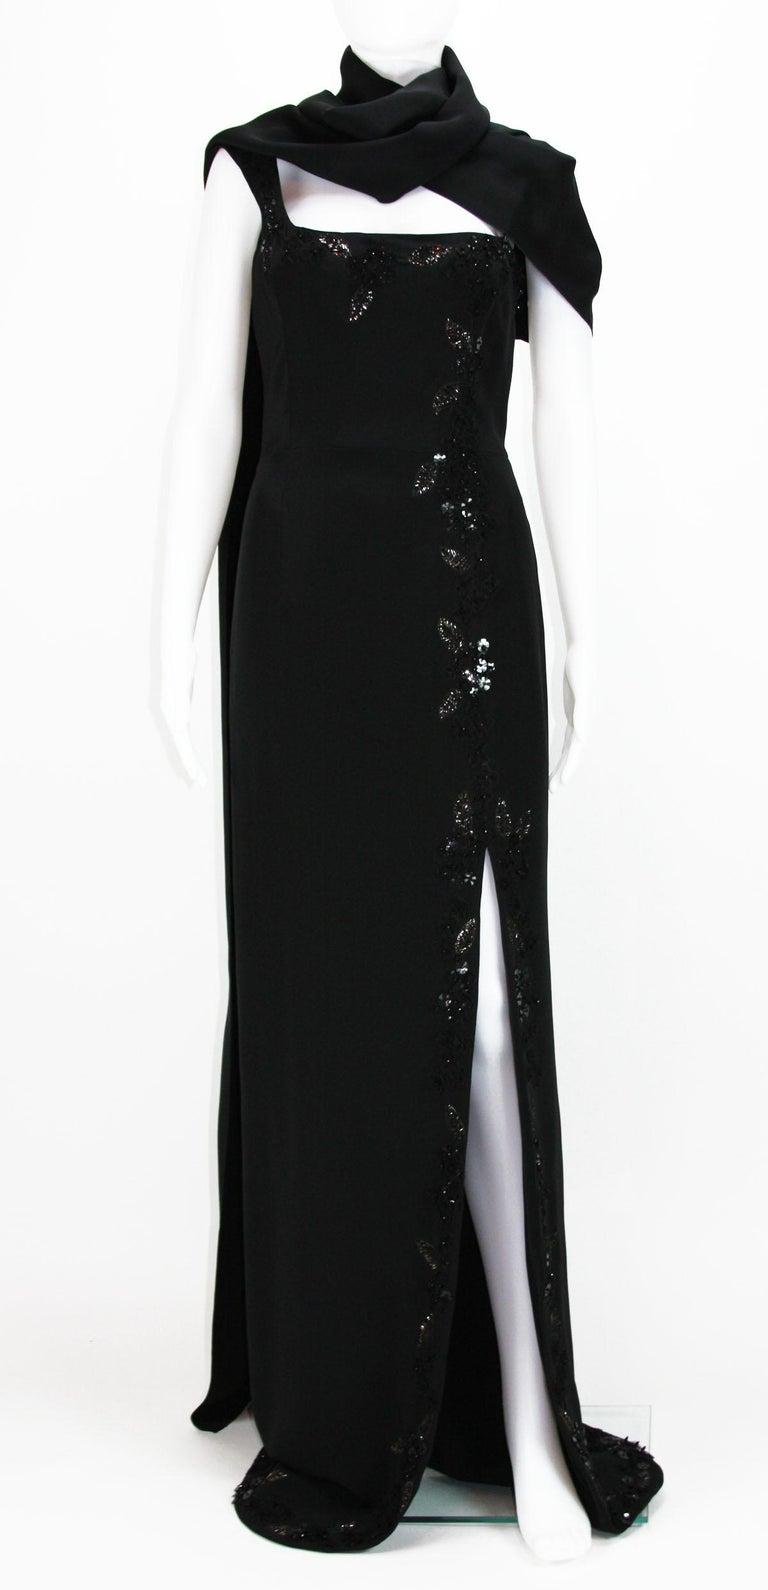 New $7500 L'WREN SCOTT S/S 2010 Represent Her *MADAME DU BARRY* Black Dress Gown For Sale 2